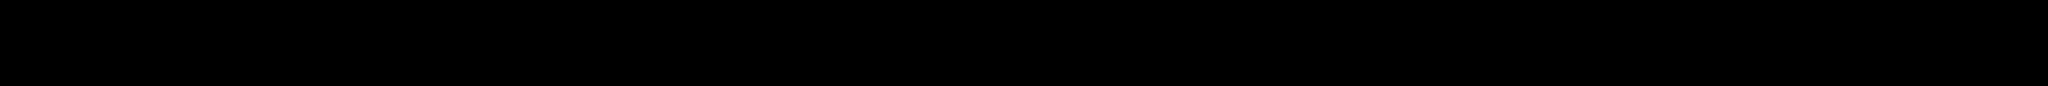 TRW 1K0 615 106 AL, 1K0 698 151, 1K0 698 151 C, 1K0 698 151 E, 3C0 698 151 A Bremsekloss sett